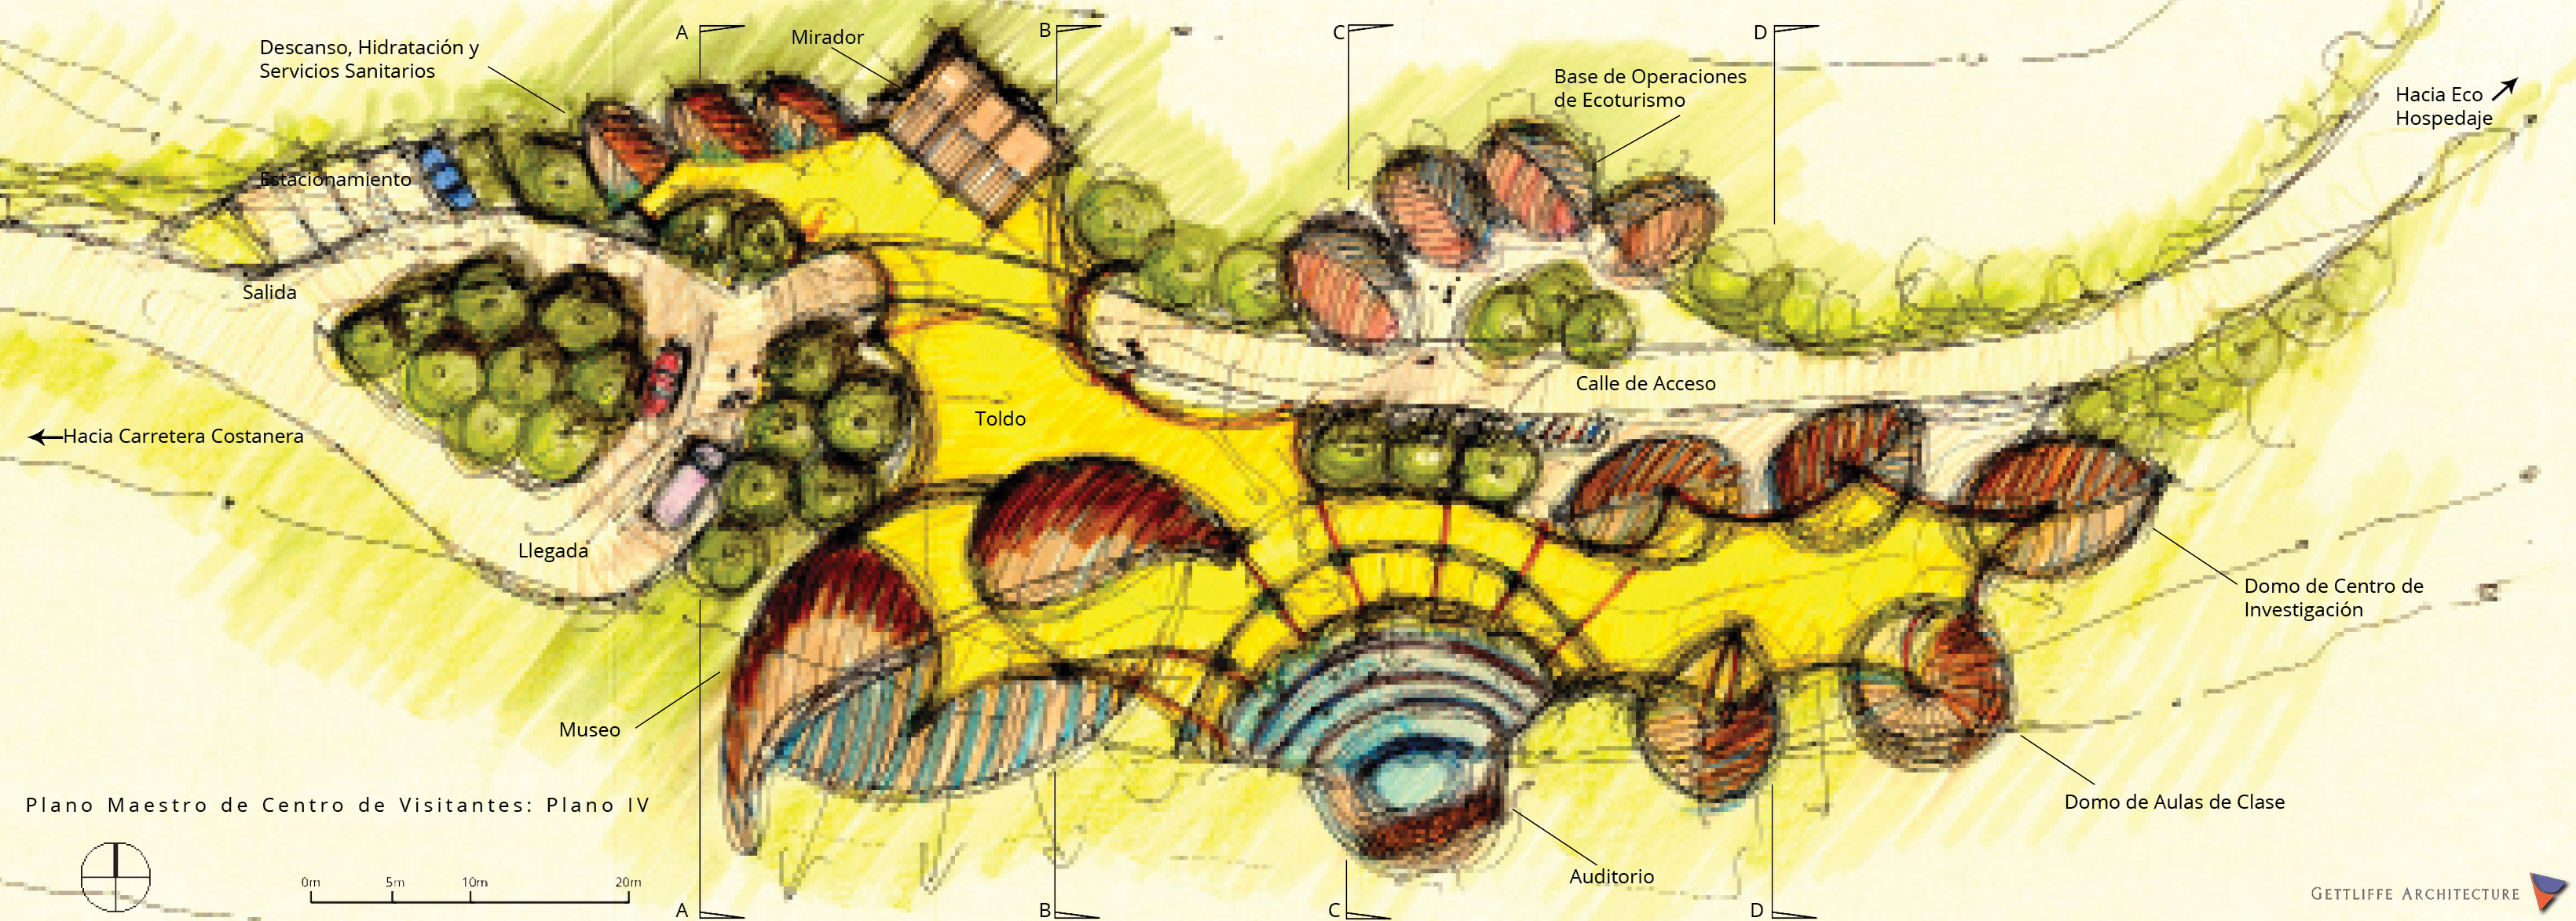 180130 ITSA Feasibility Study & Conceptual Design Booklet6